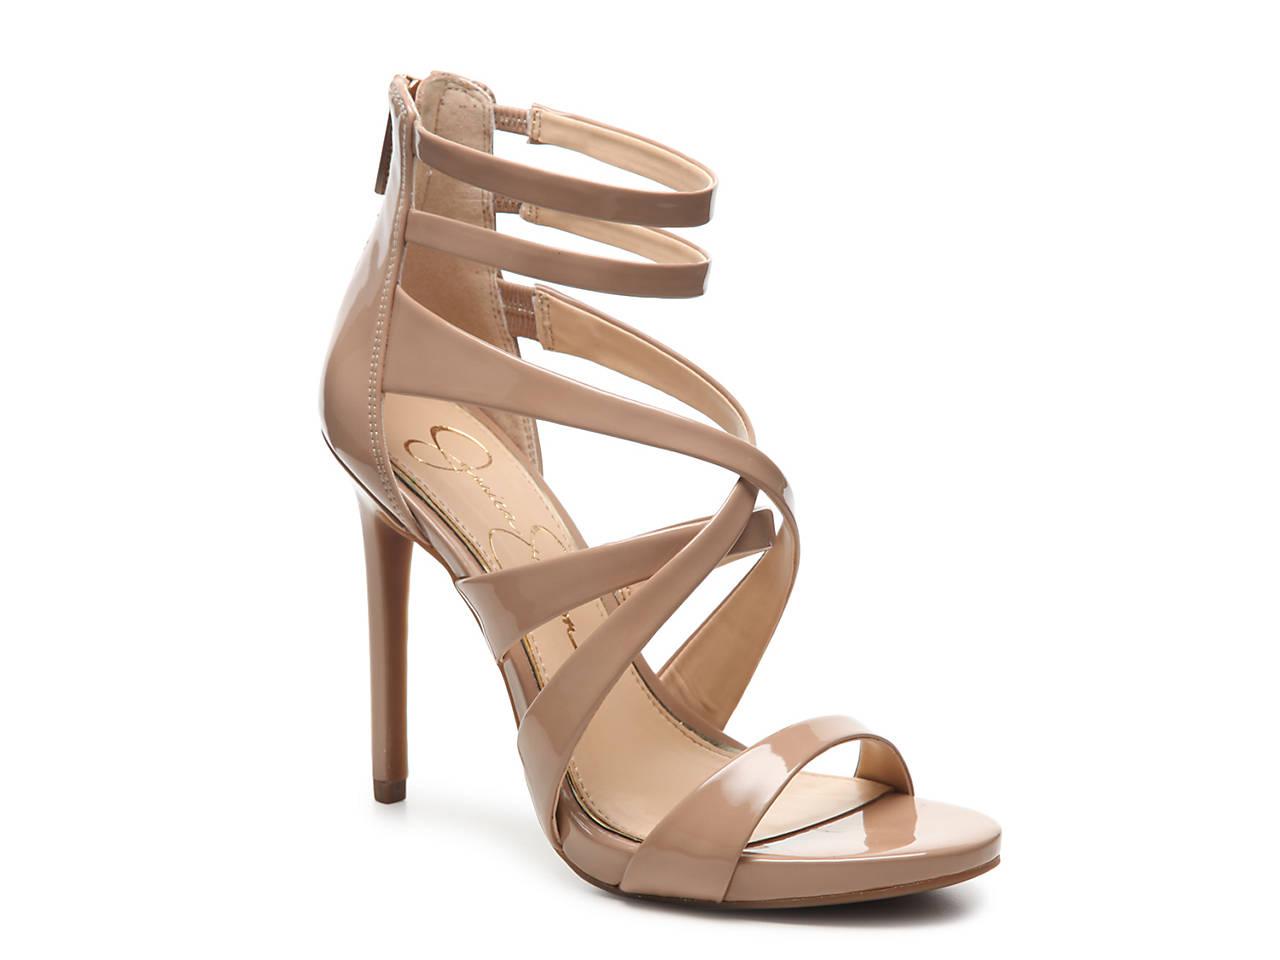 c0ee1201a01f Jessica Simpson Rayomi Platform Sandal Women s Shoes